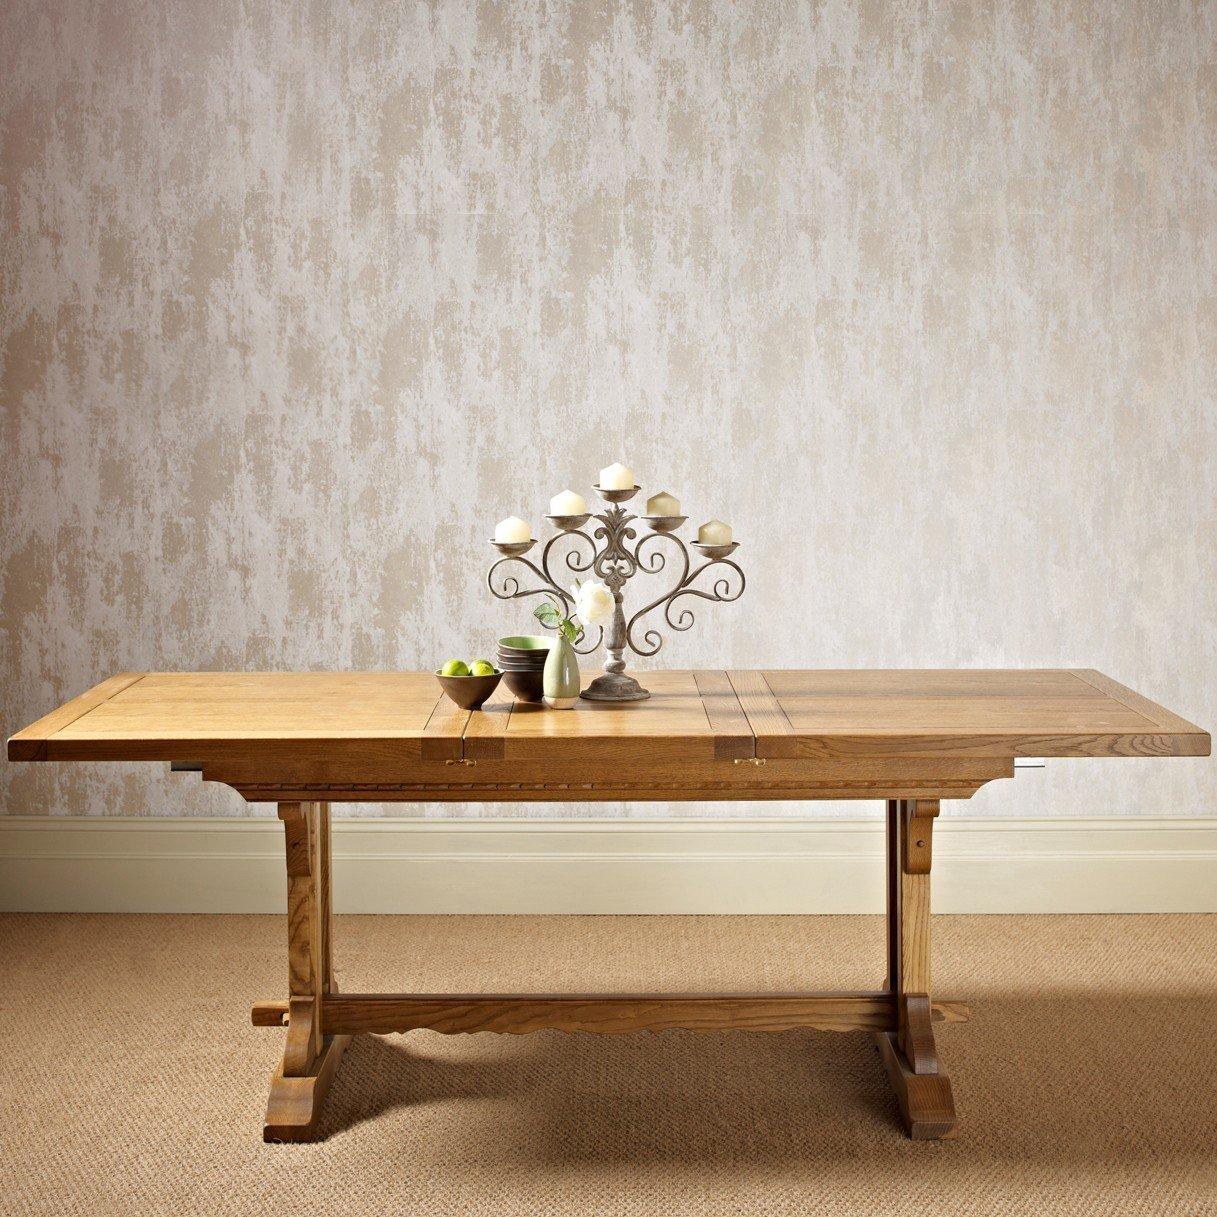 Square_richmond_table